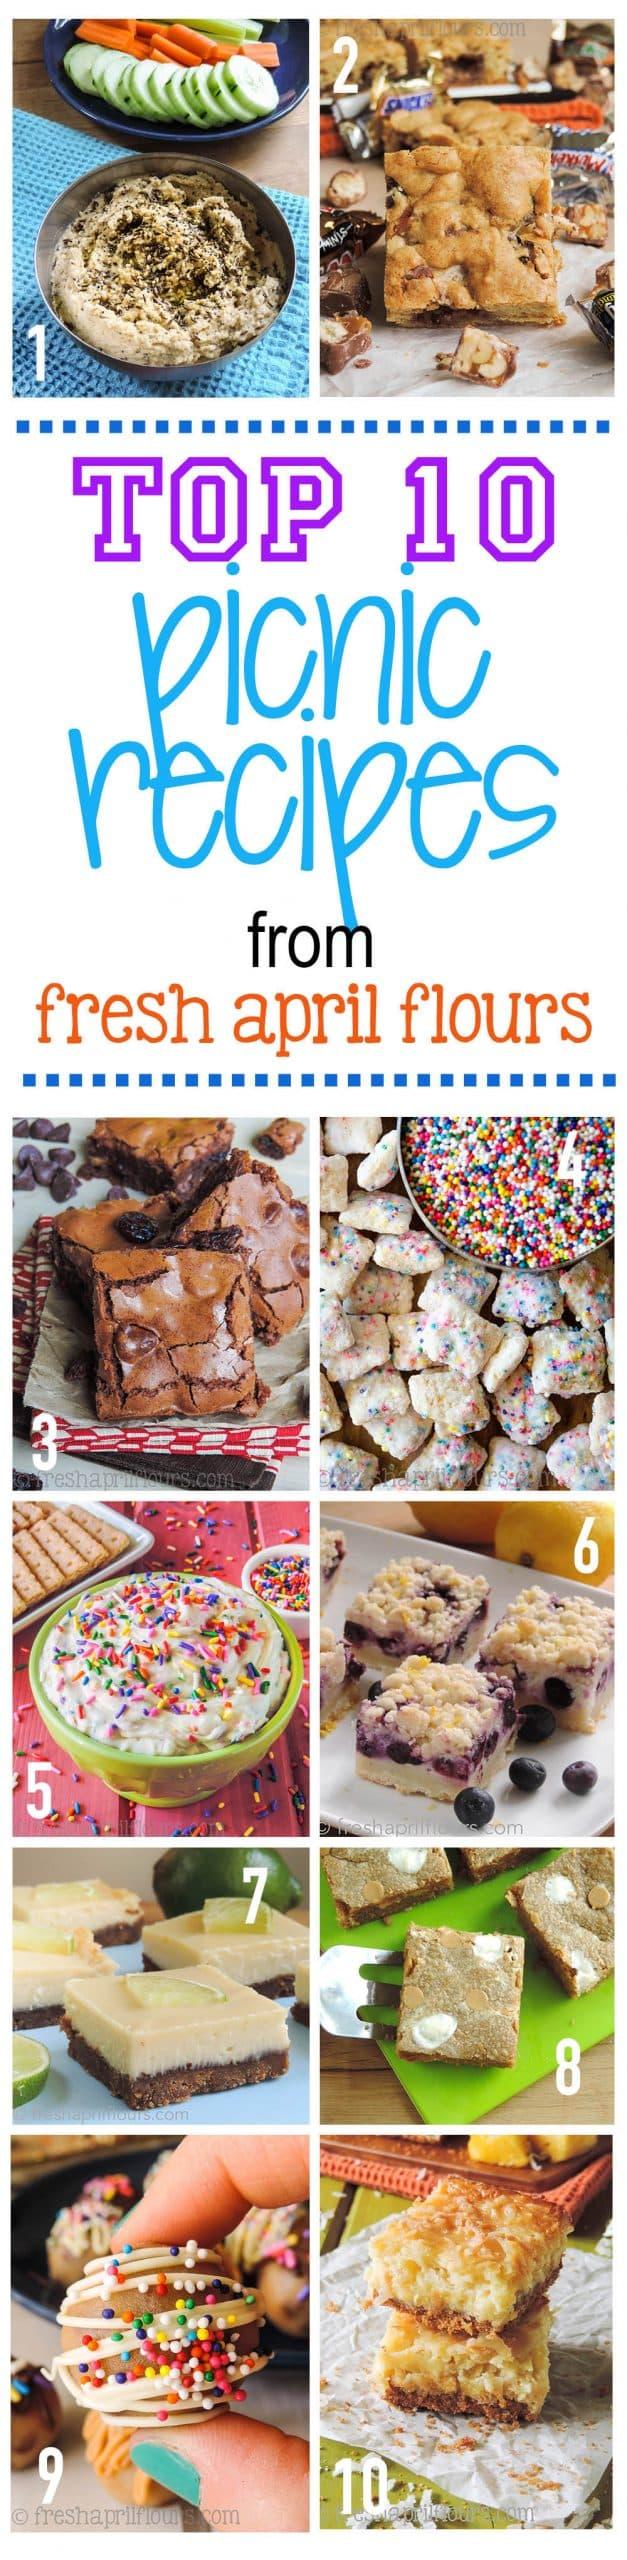 Top 10 Picnic Recipes from Fresh April Flours